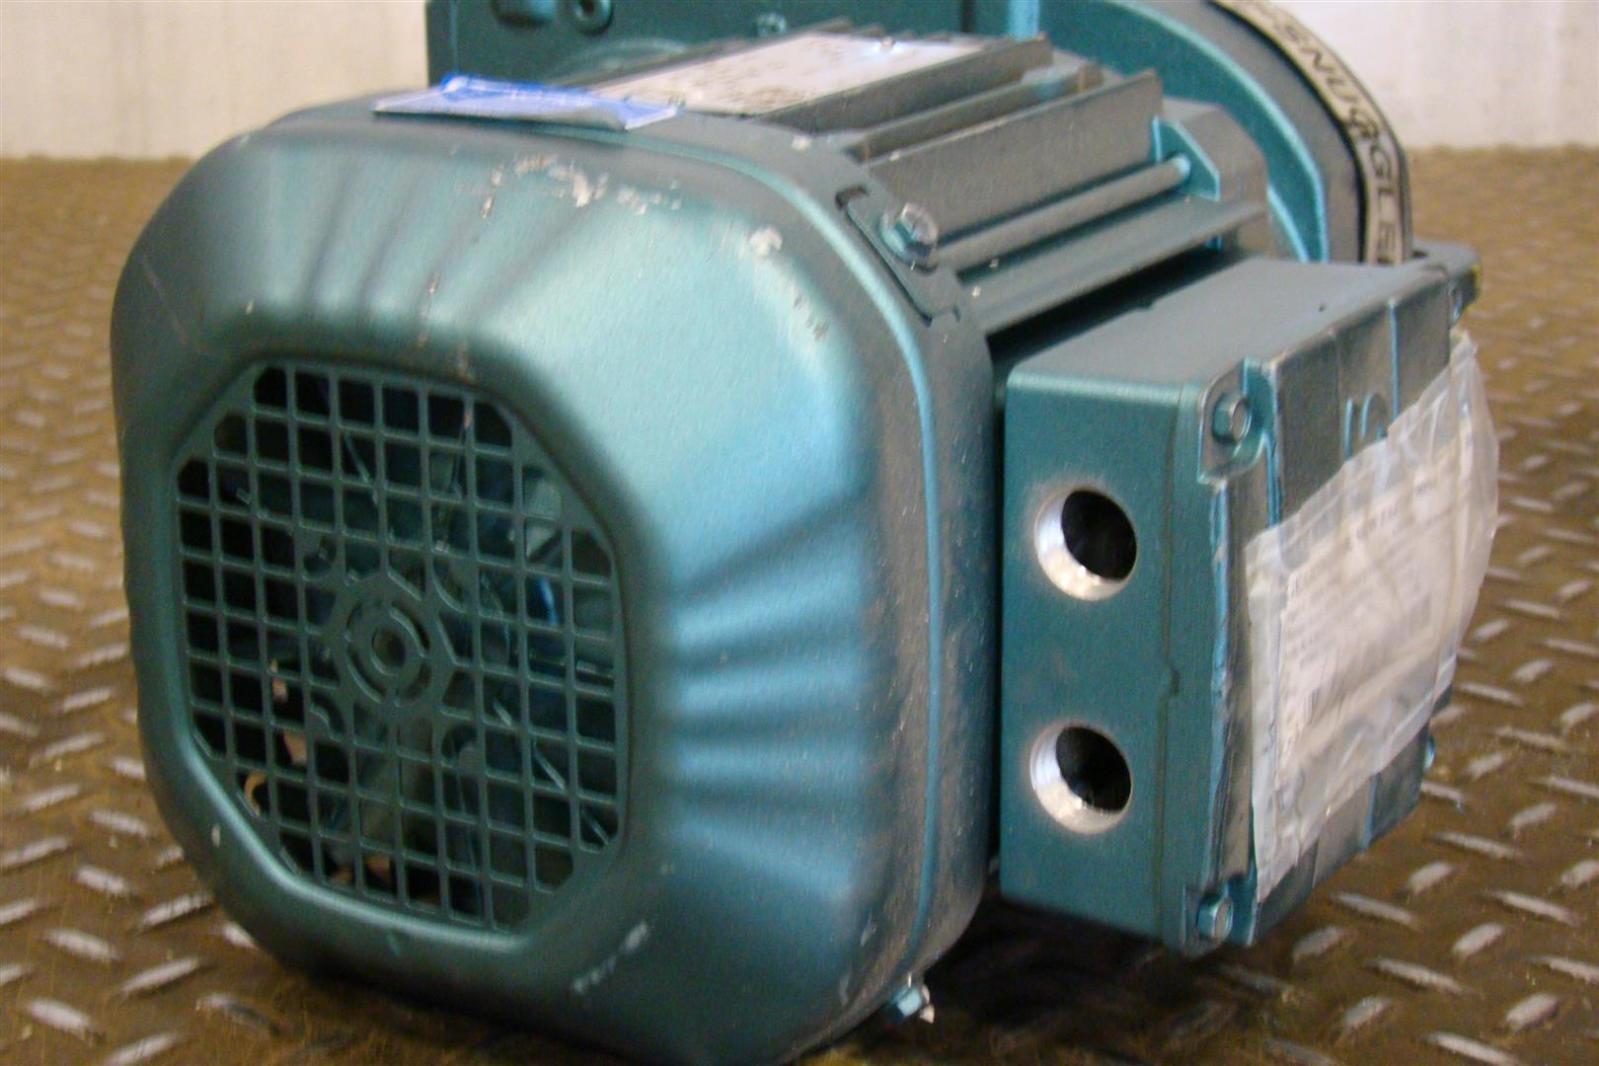 Sew eurodrive gear motor 230 460v 1 5hp 1740rpm for Sew motors and drives